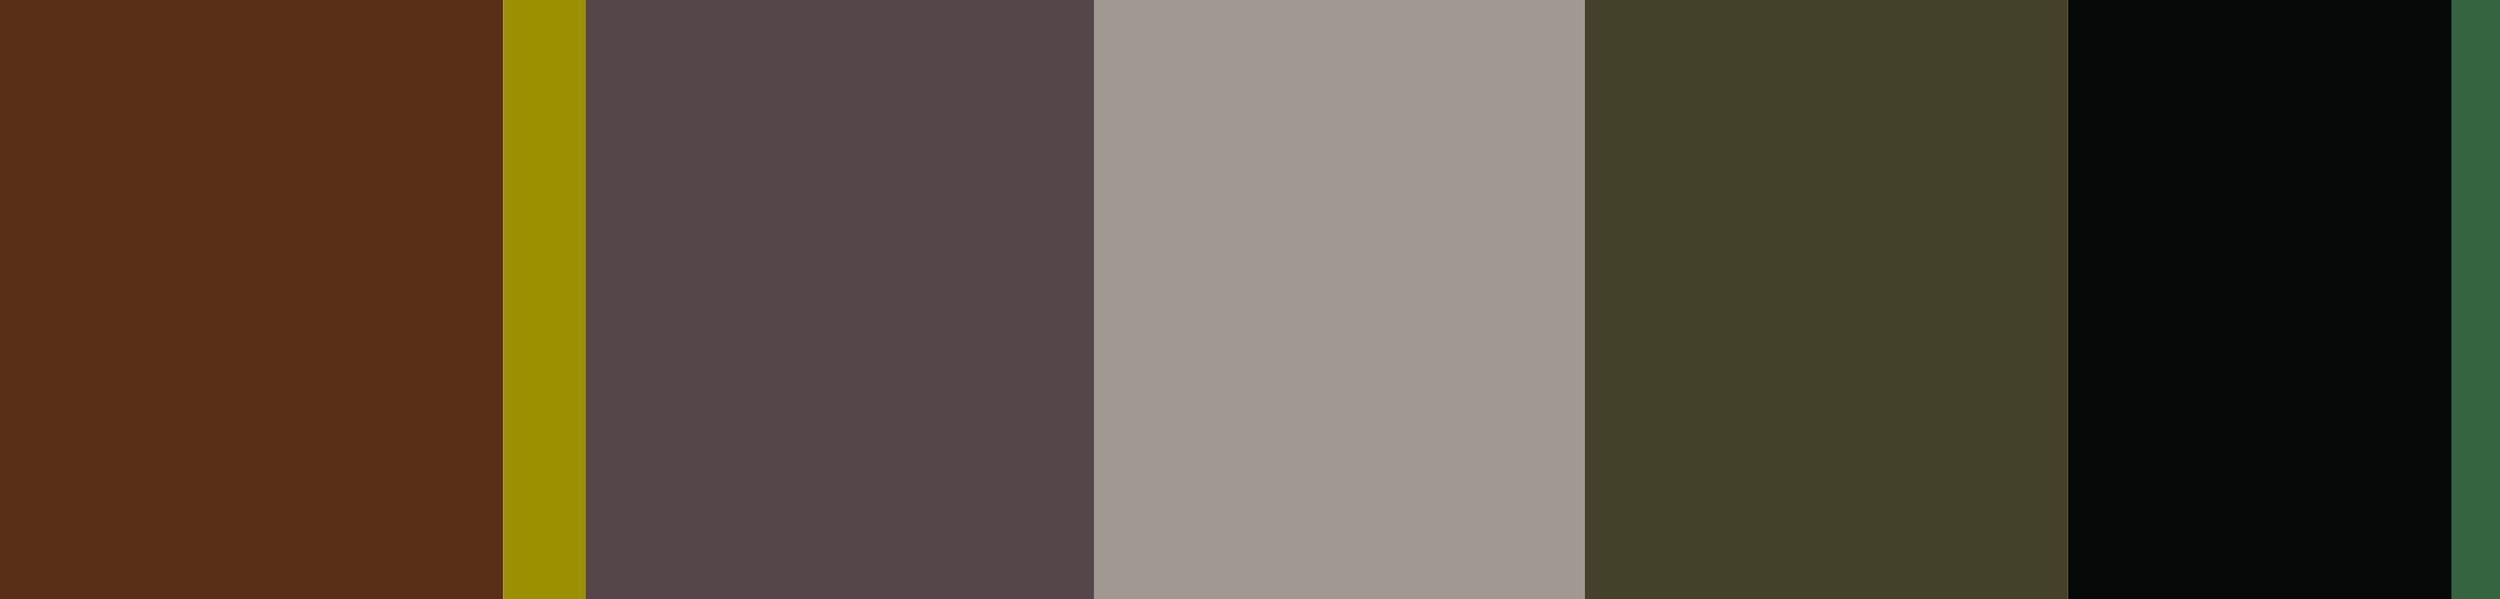 Kleurkaart Analog November 2014